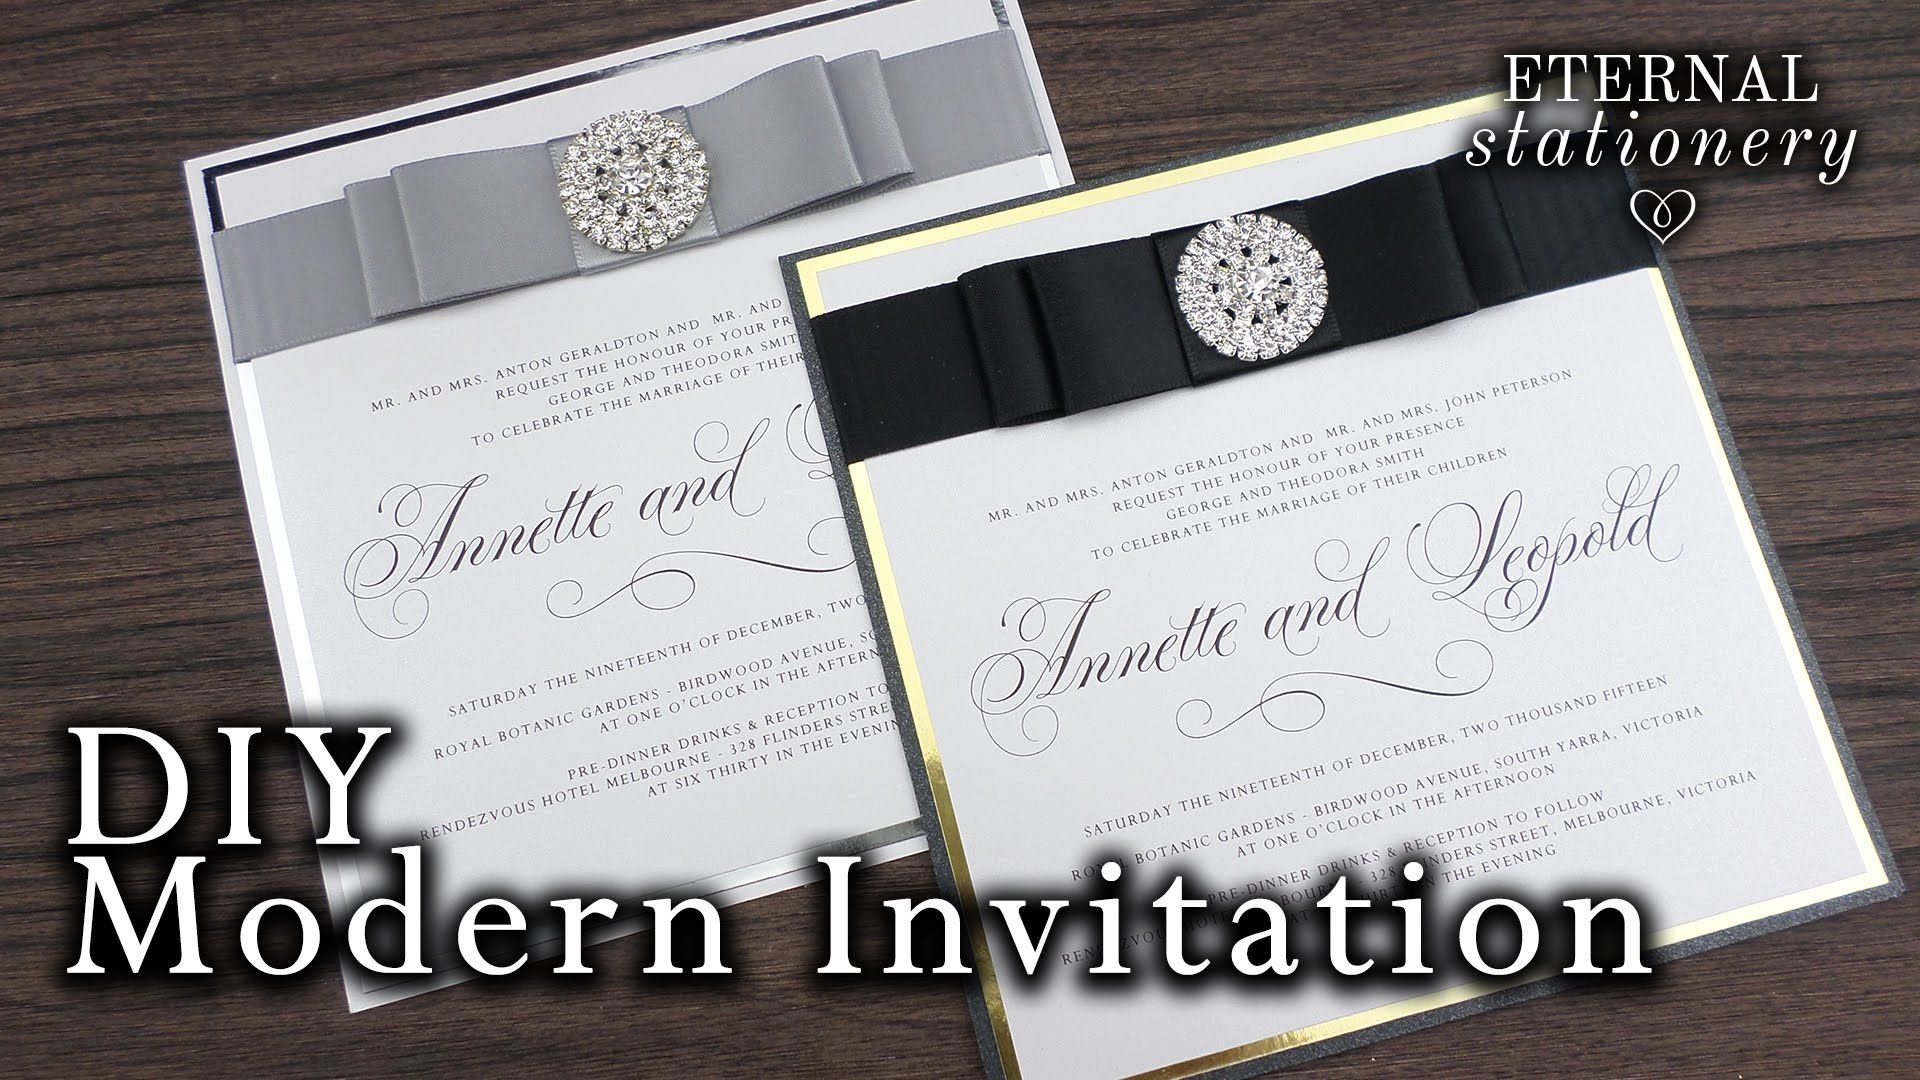 How to make elegant modern wedding invitations   DIY invitation ...